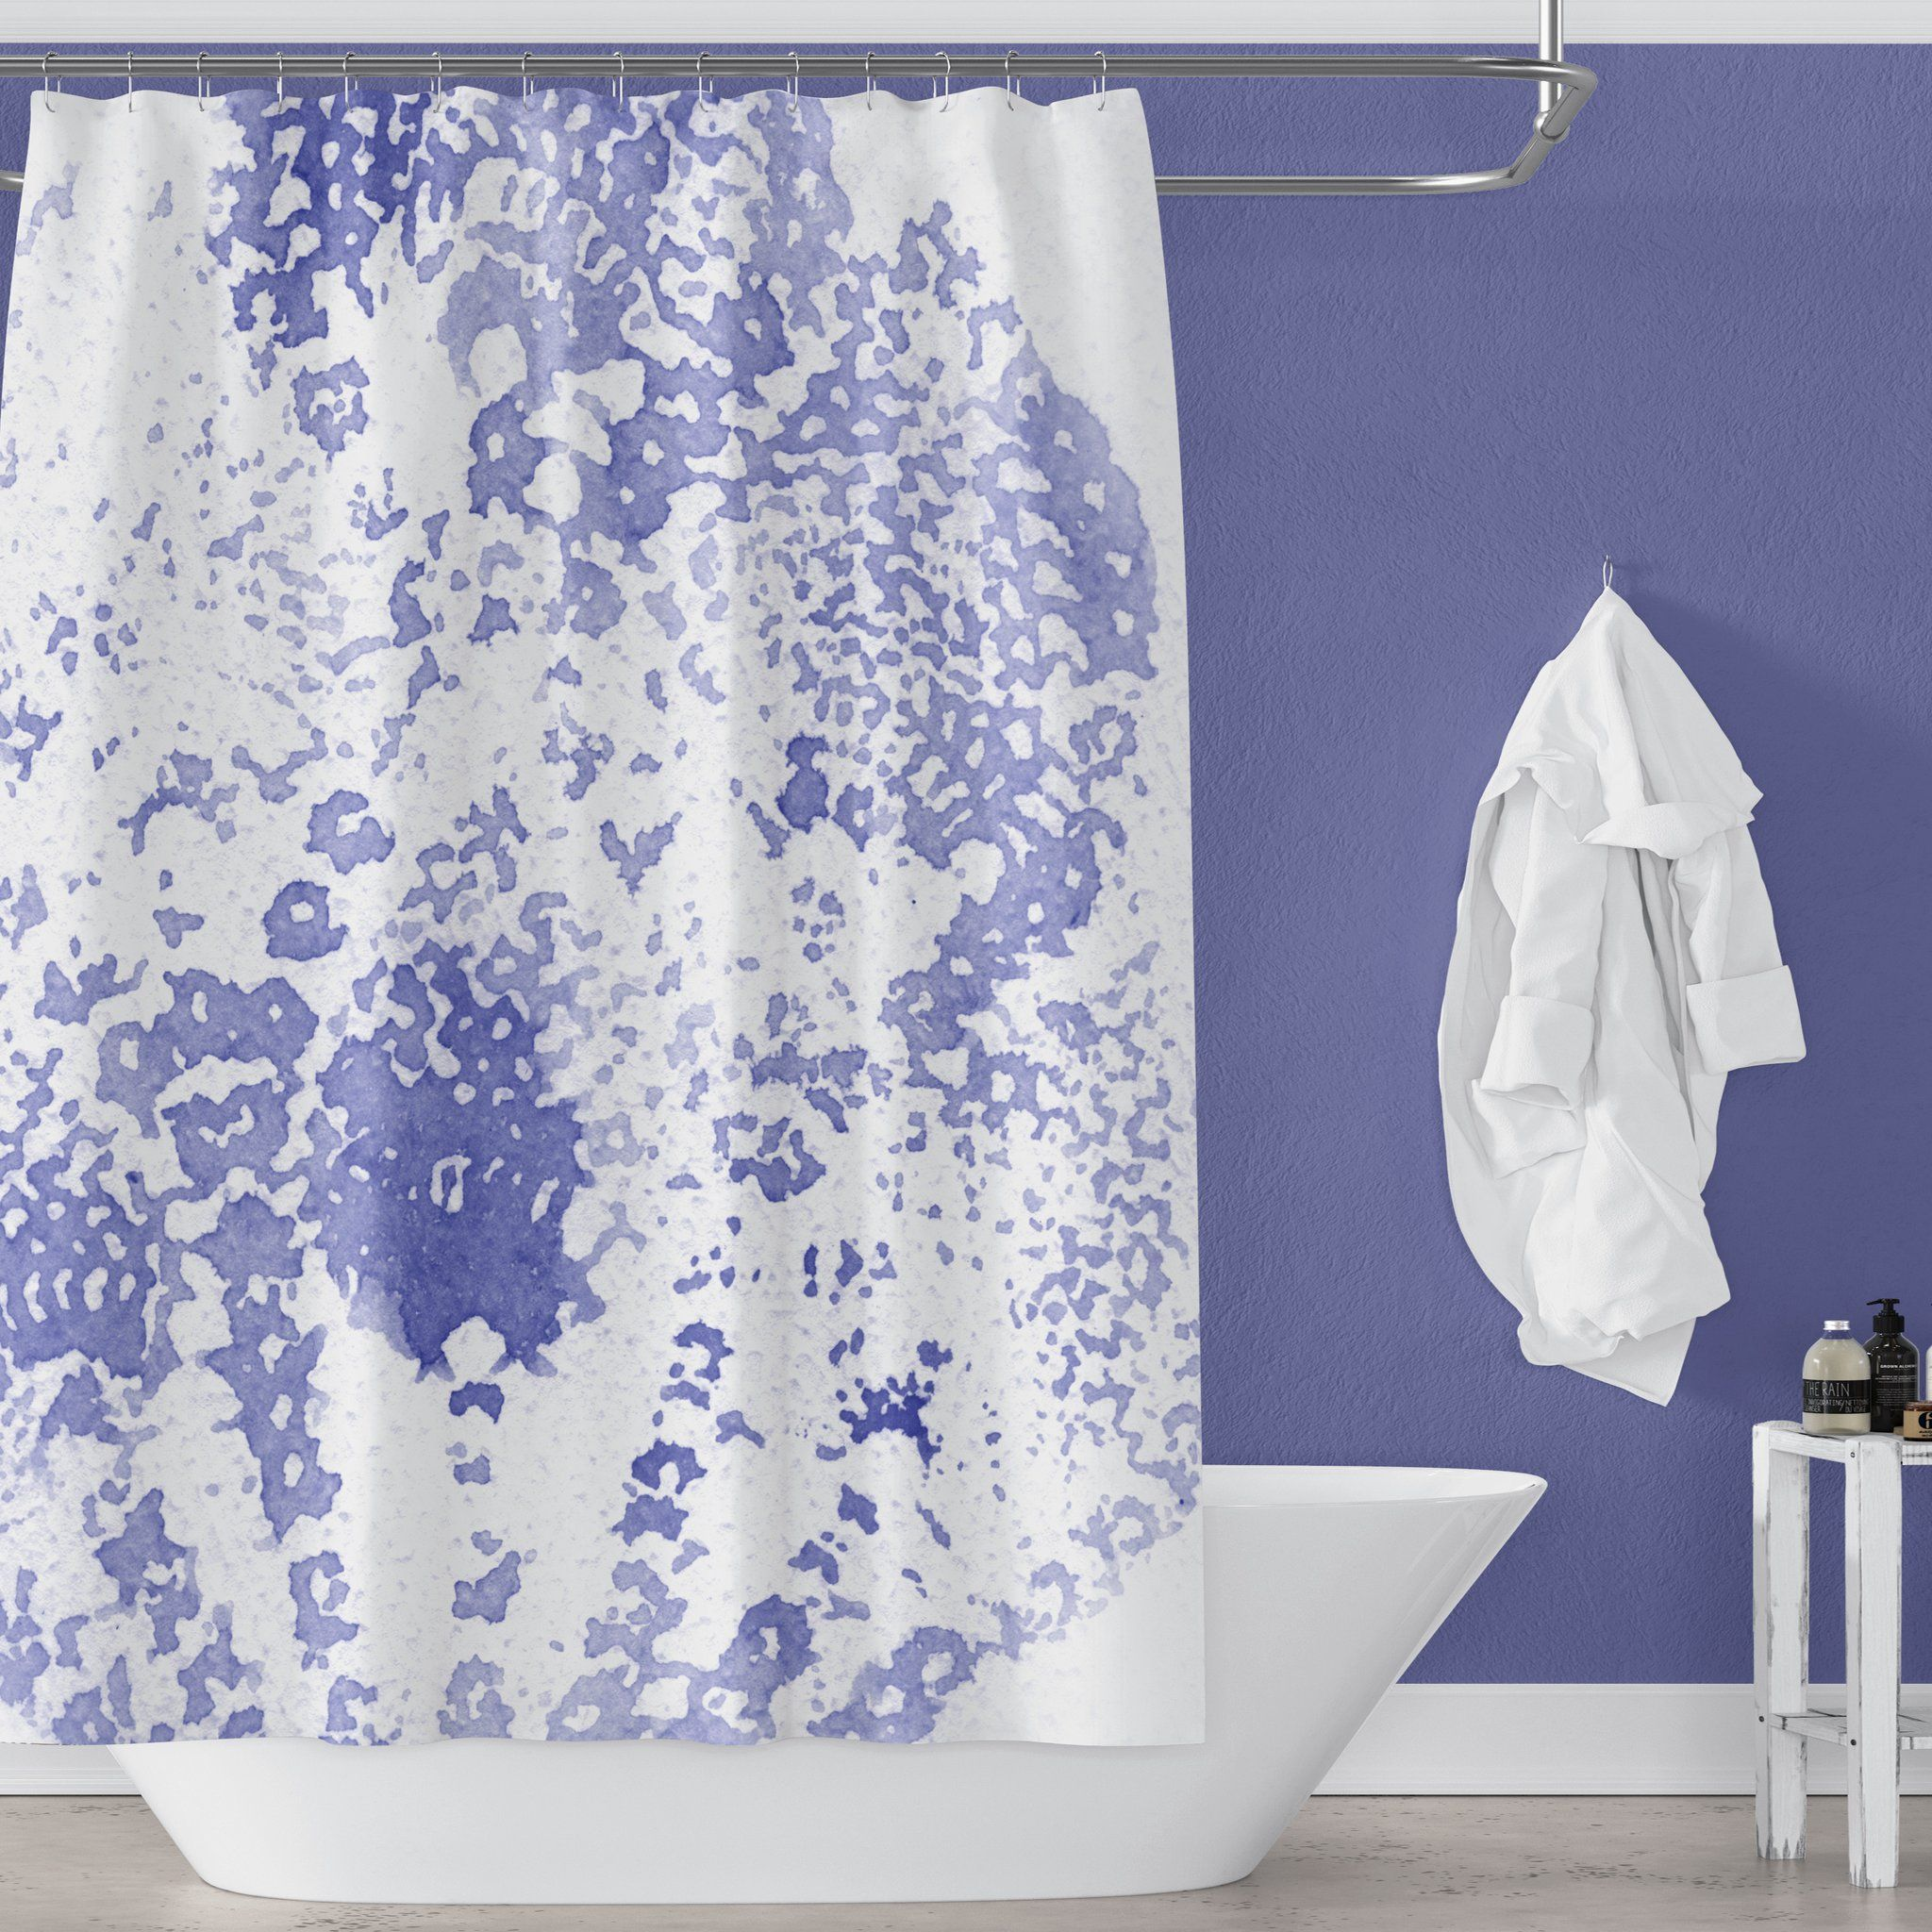 Boho Periwinkle Violet Blue Watercolor Bathroom Decor Floral